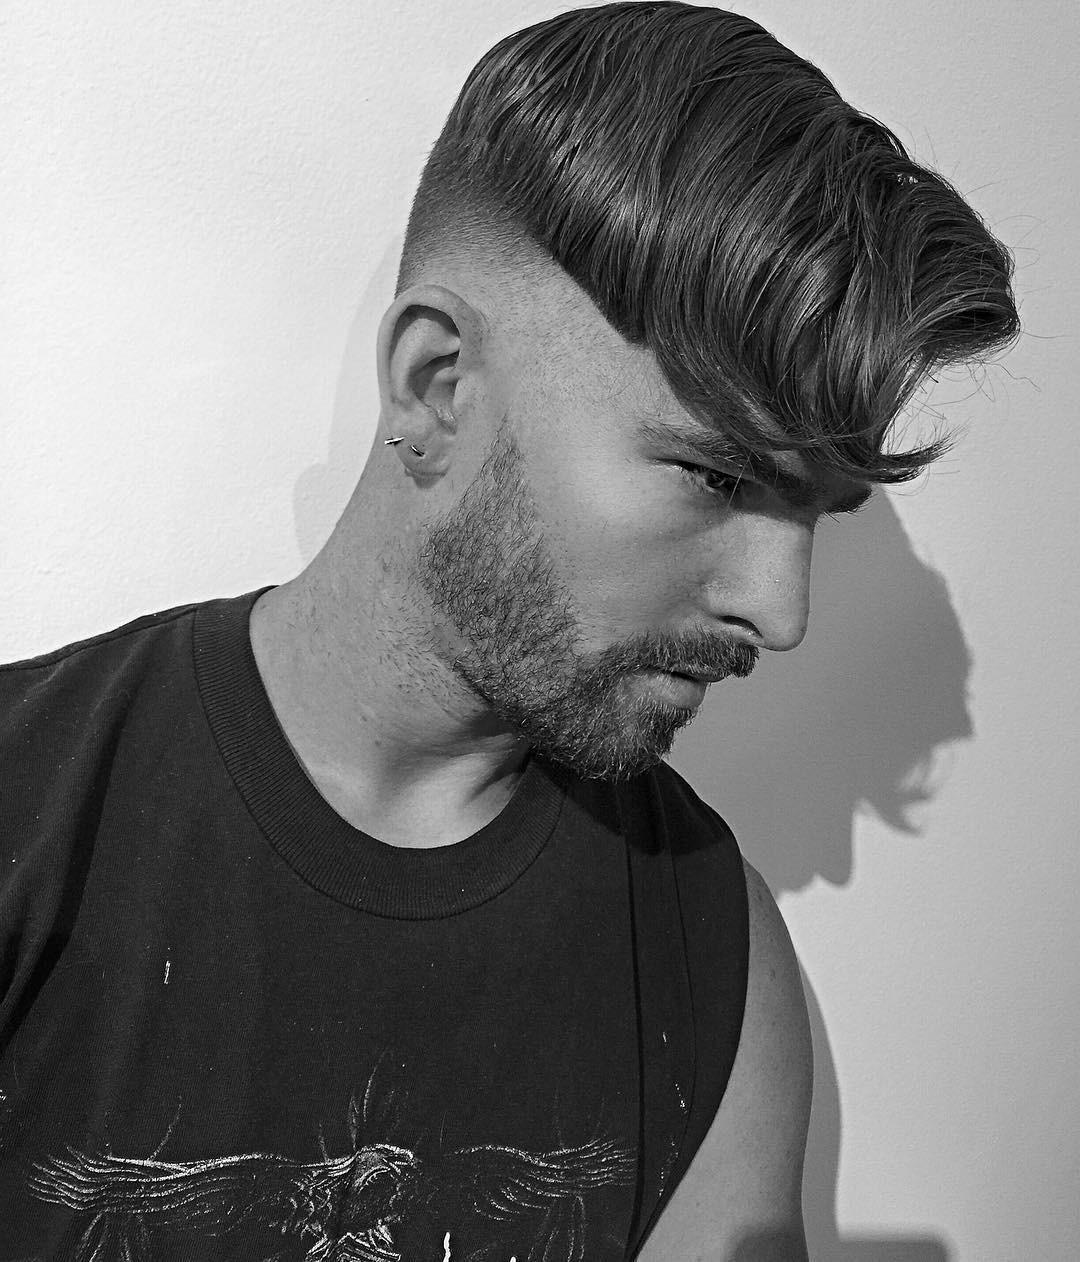 Undercut Hairstyle Male  21 New Undercut Hairstyles For Men